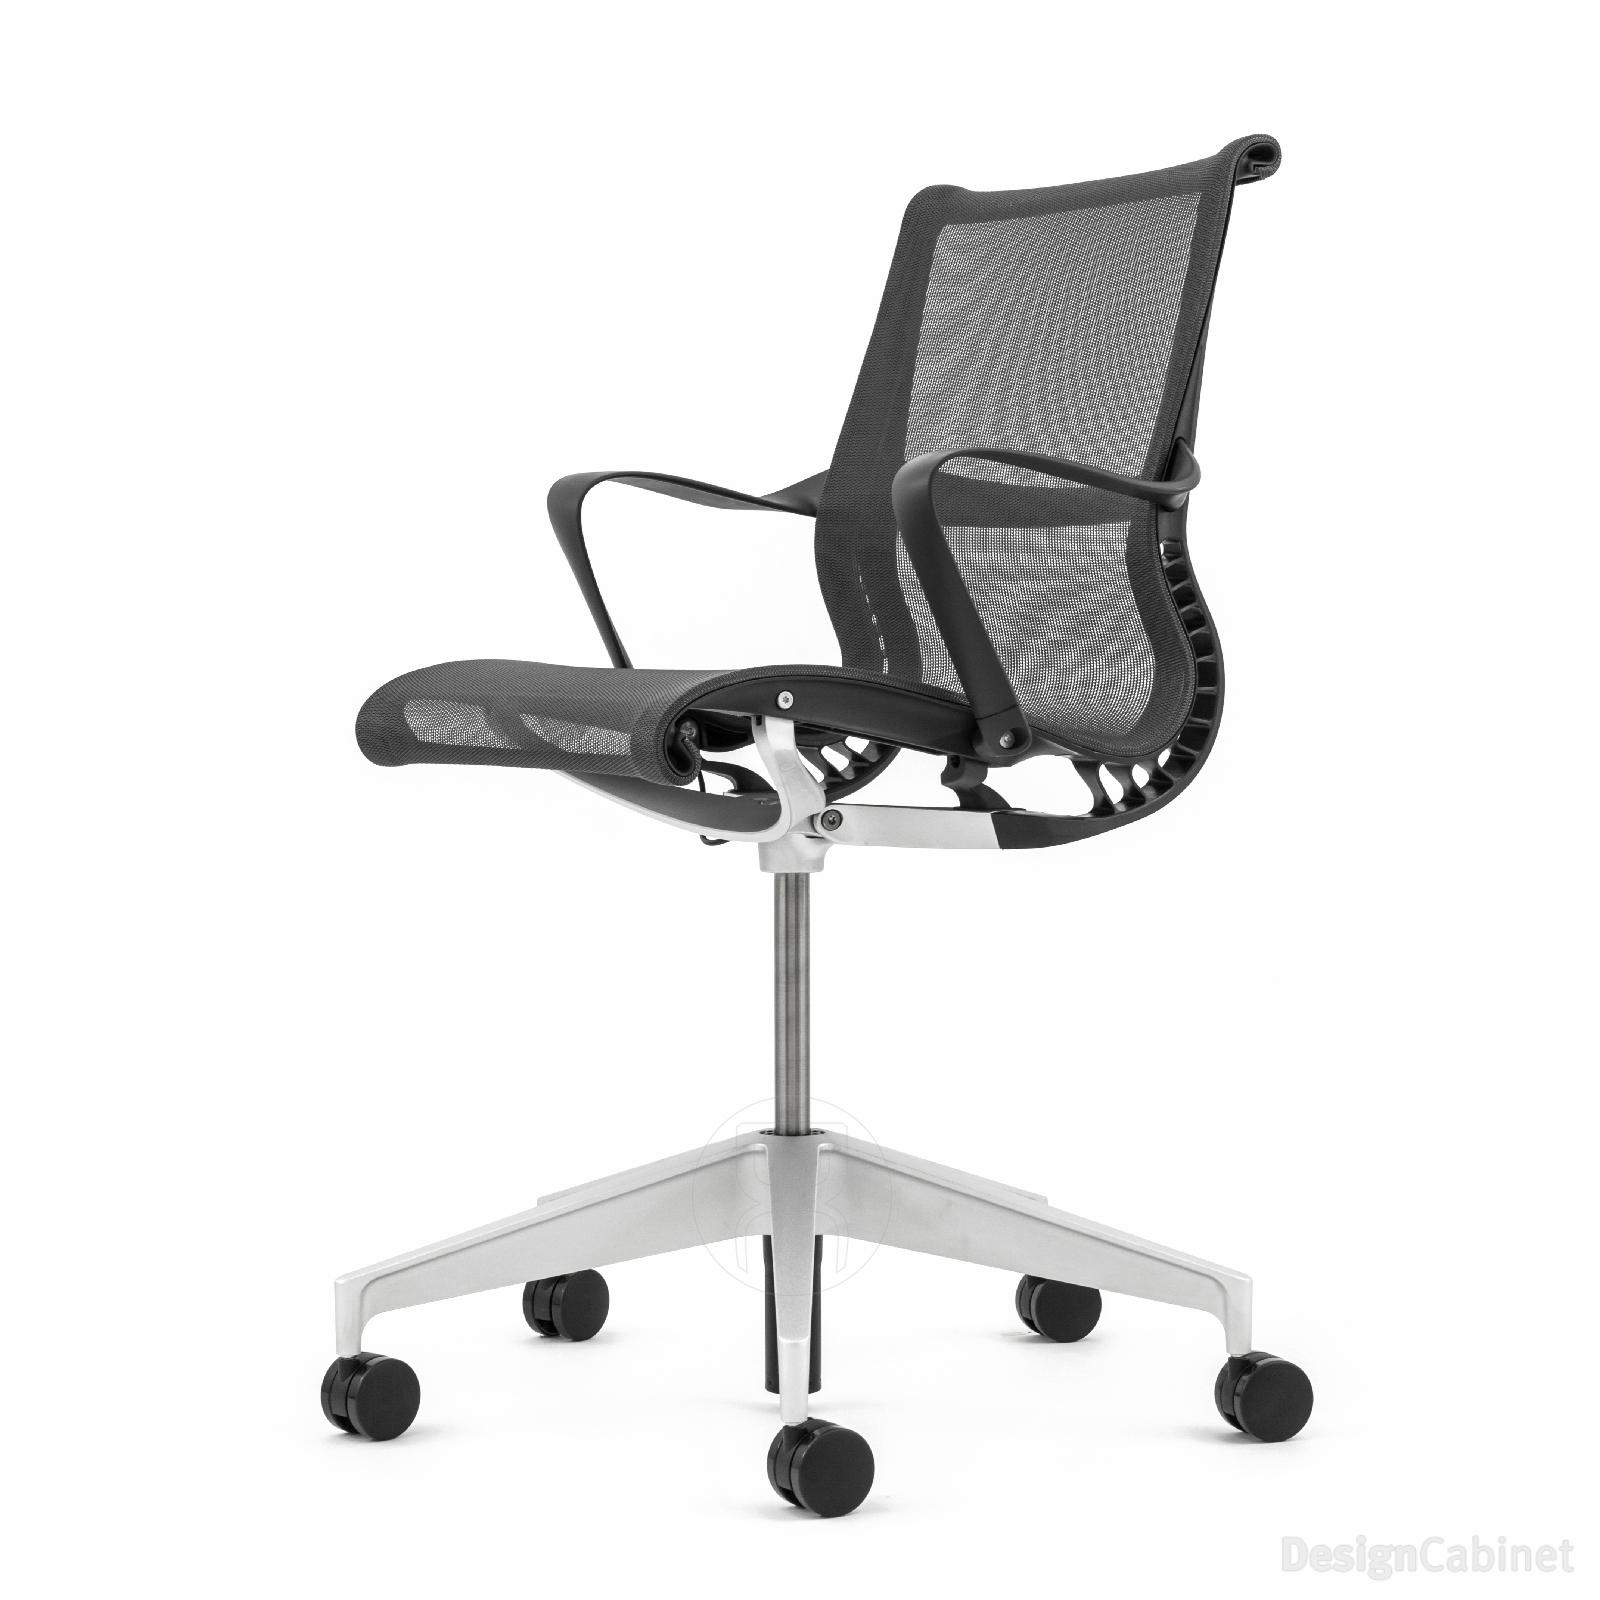 Elegant Herman Miller Schreibtischstuhle Odprinter Com